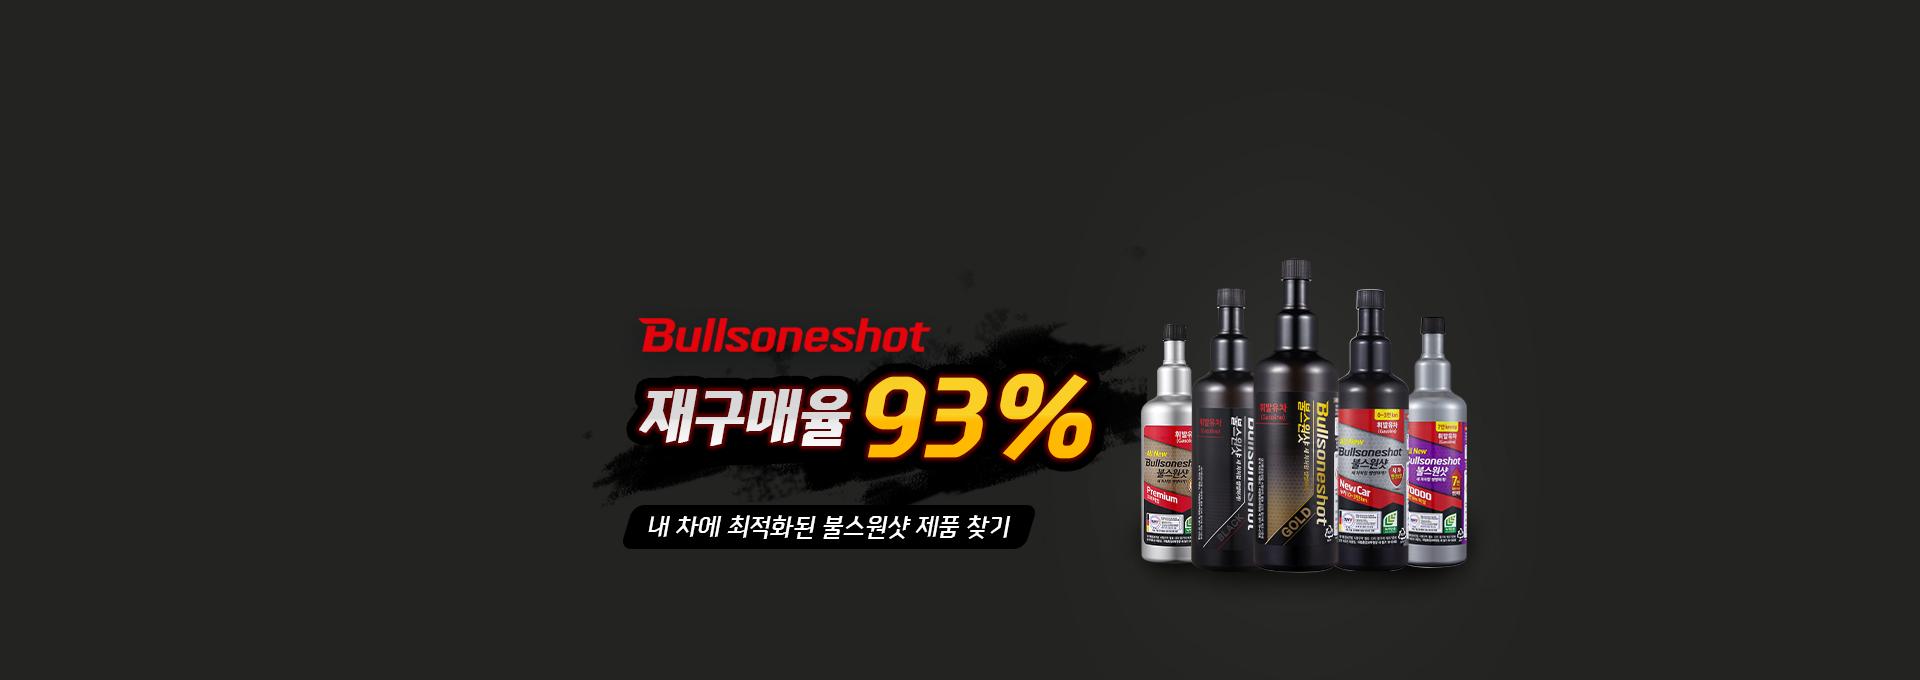 Bullsoneshot